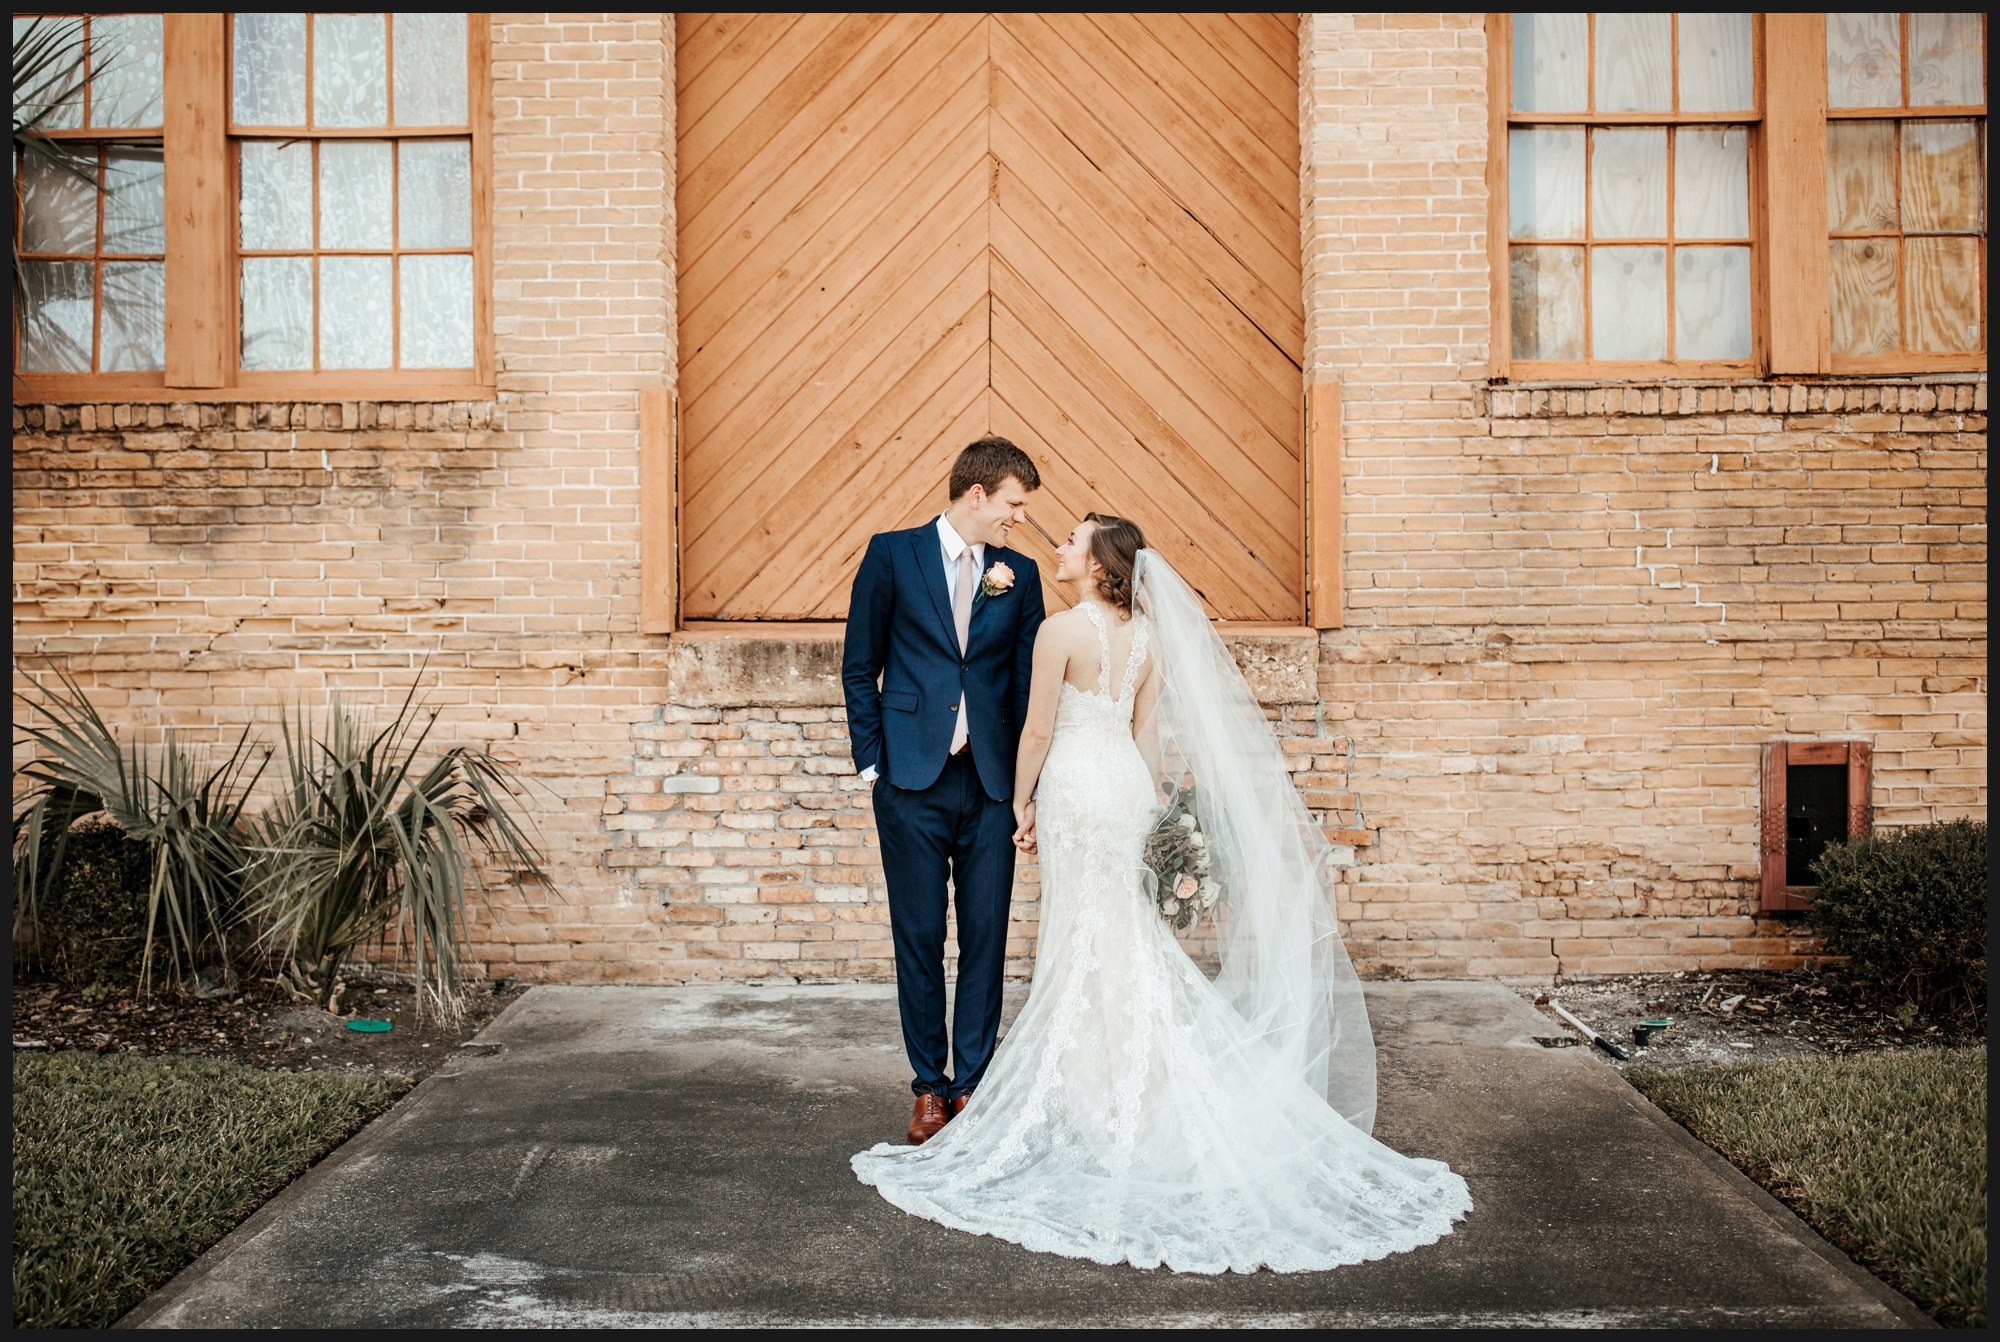 Orlando-Wedding-Photographer-destination-wedding-photographer-florida-wedding-photographer-bohemian-wedding-photographer_1760.jpg